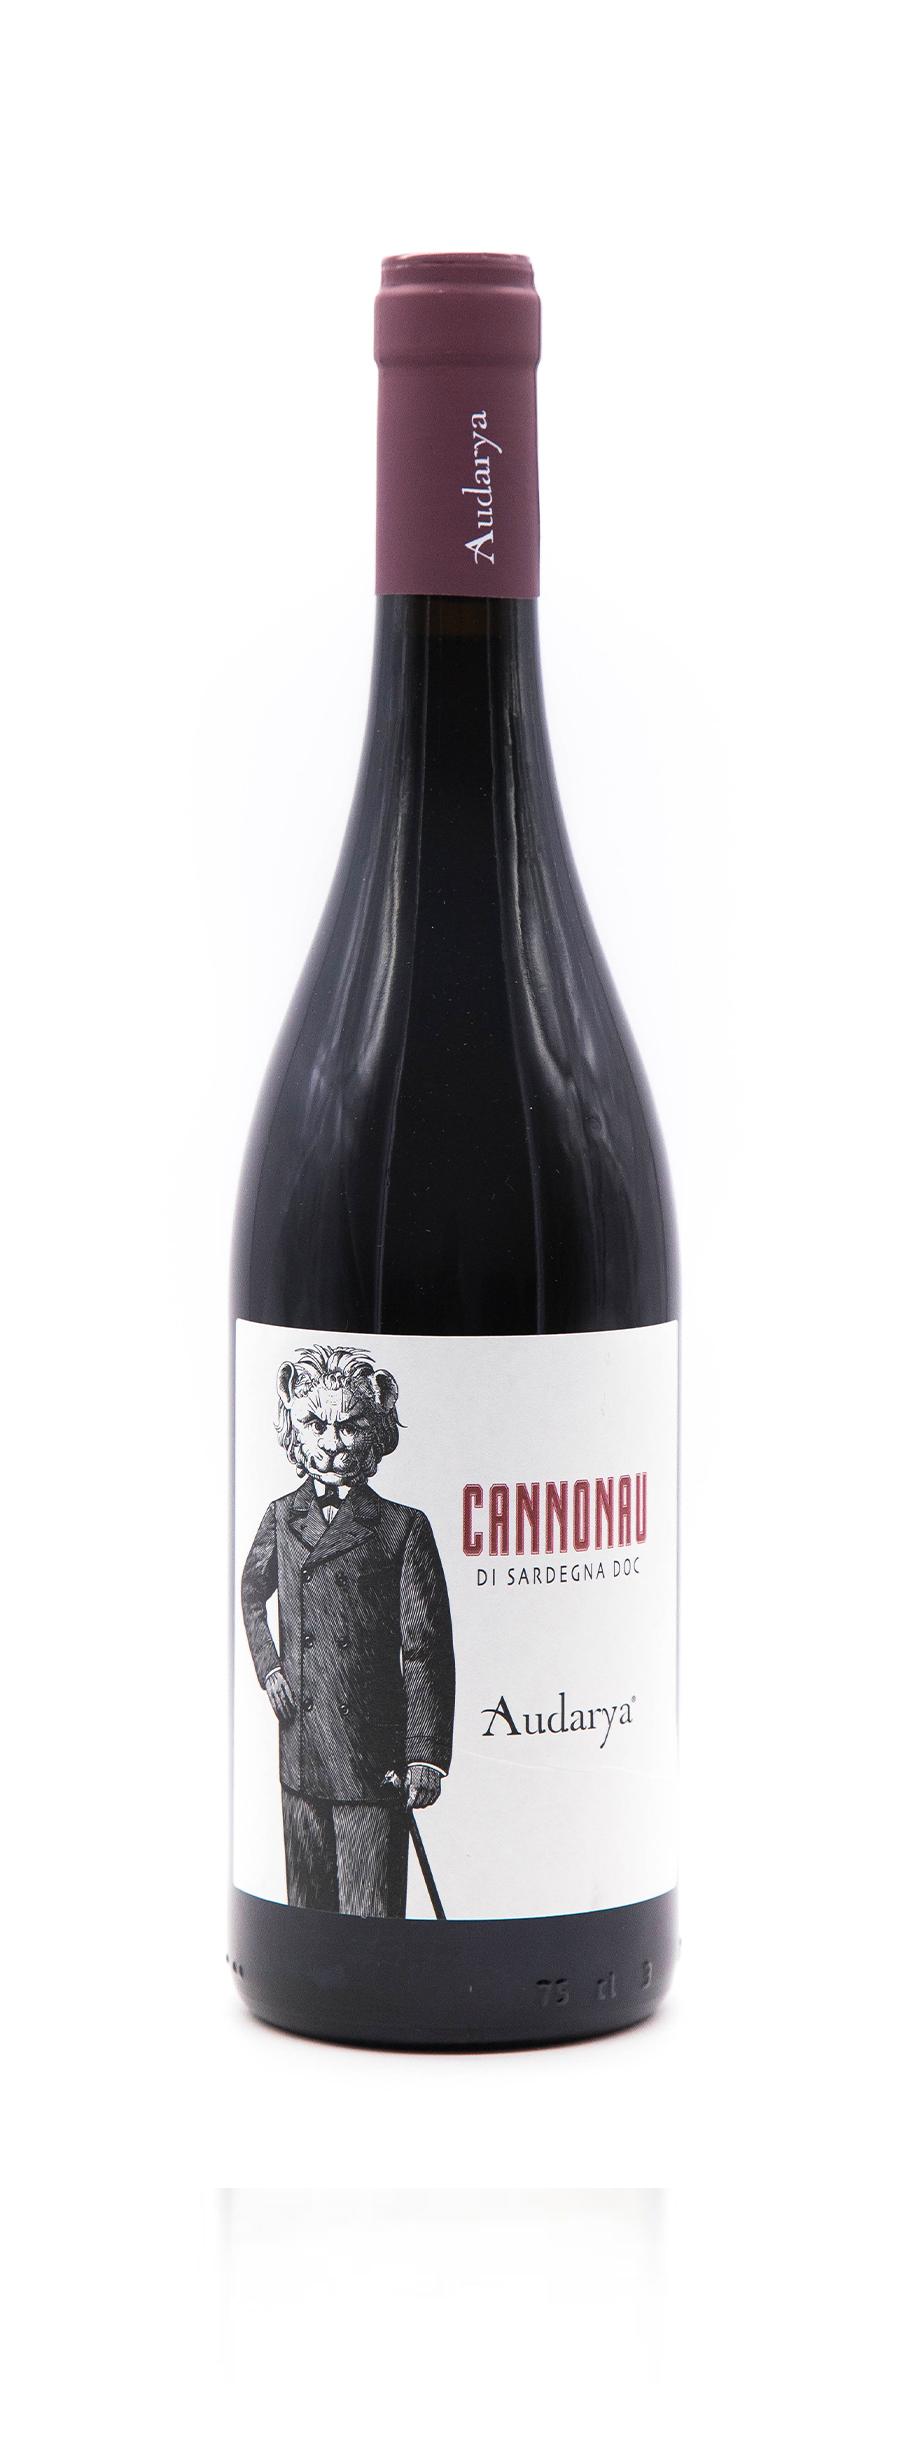 cannonau Sardegna doc audarya vino rosso